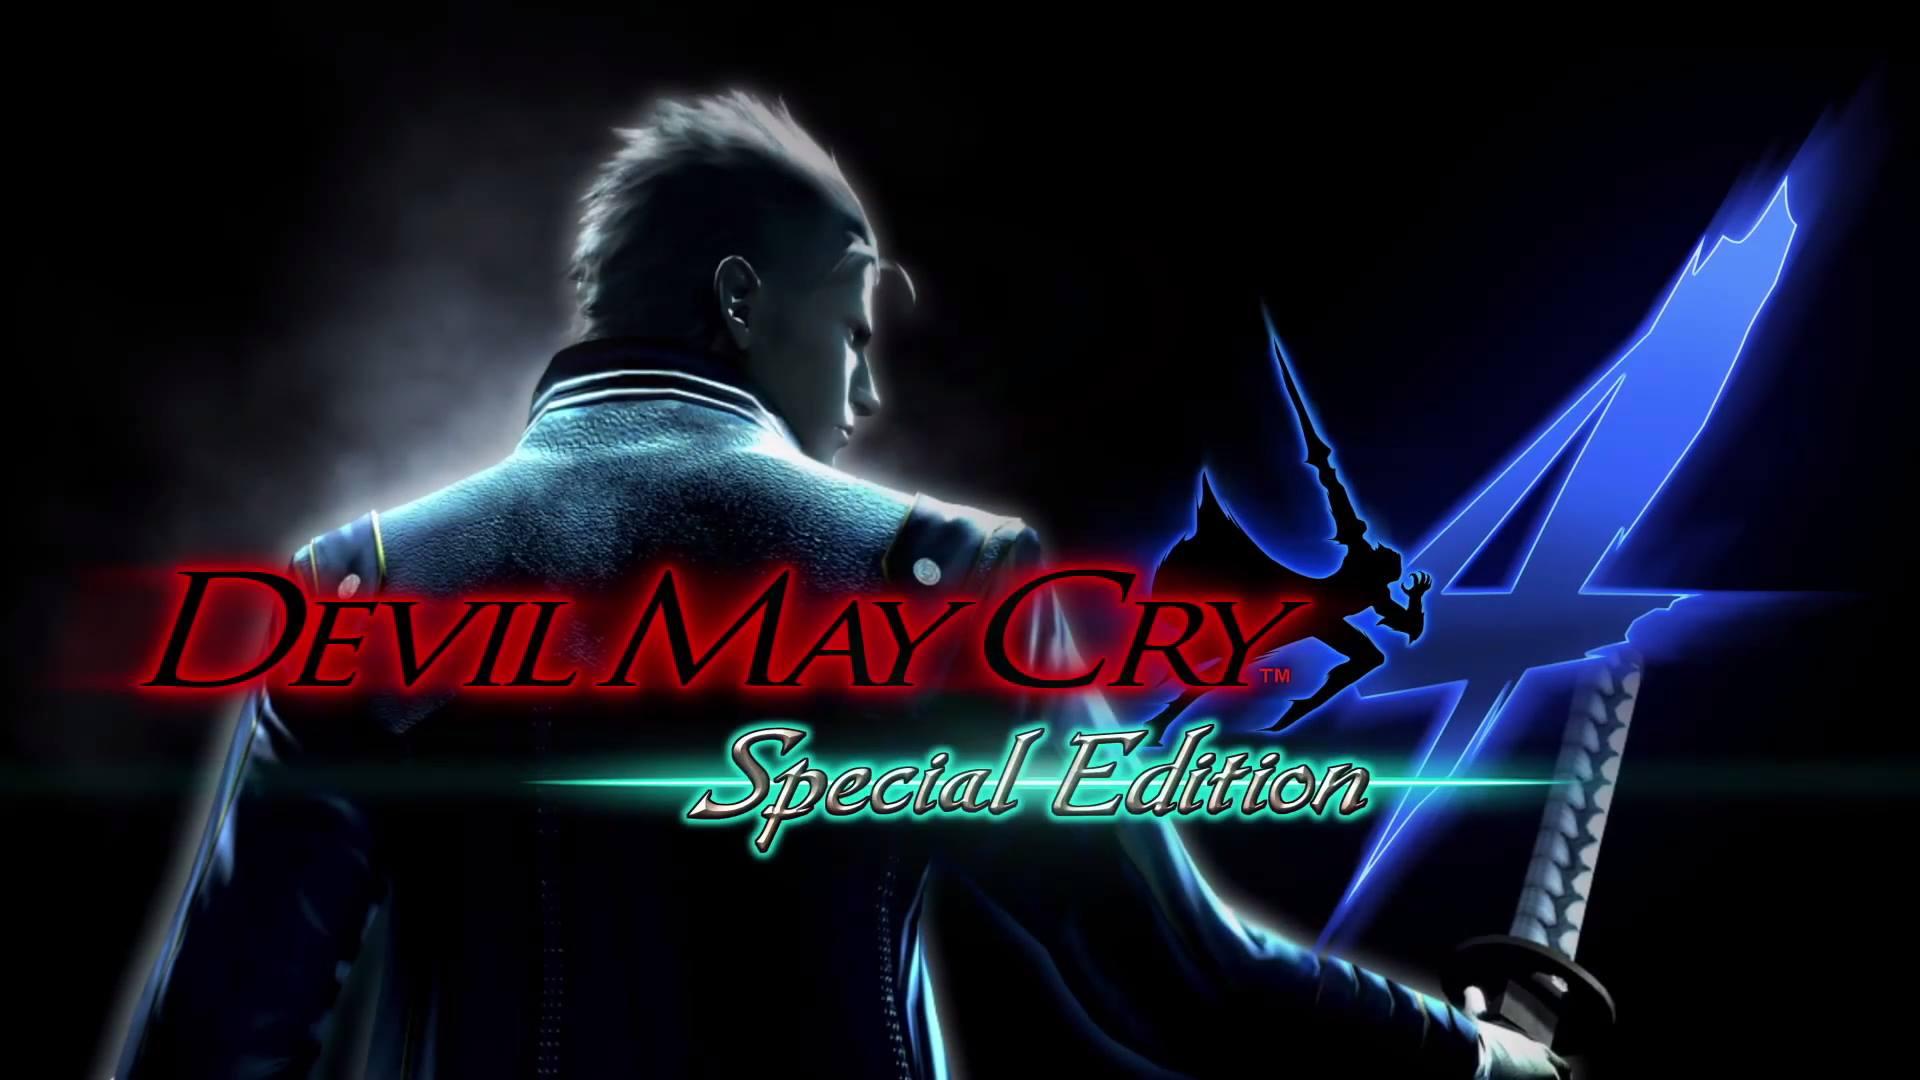 Devil May Cry 4 Special Edition Wallpaper By Britt601 On Deviantart